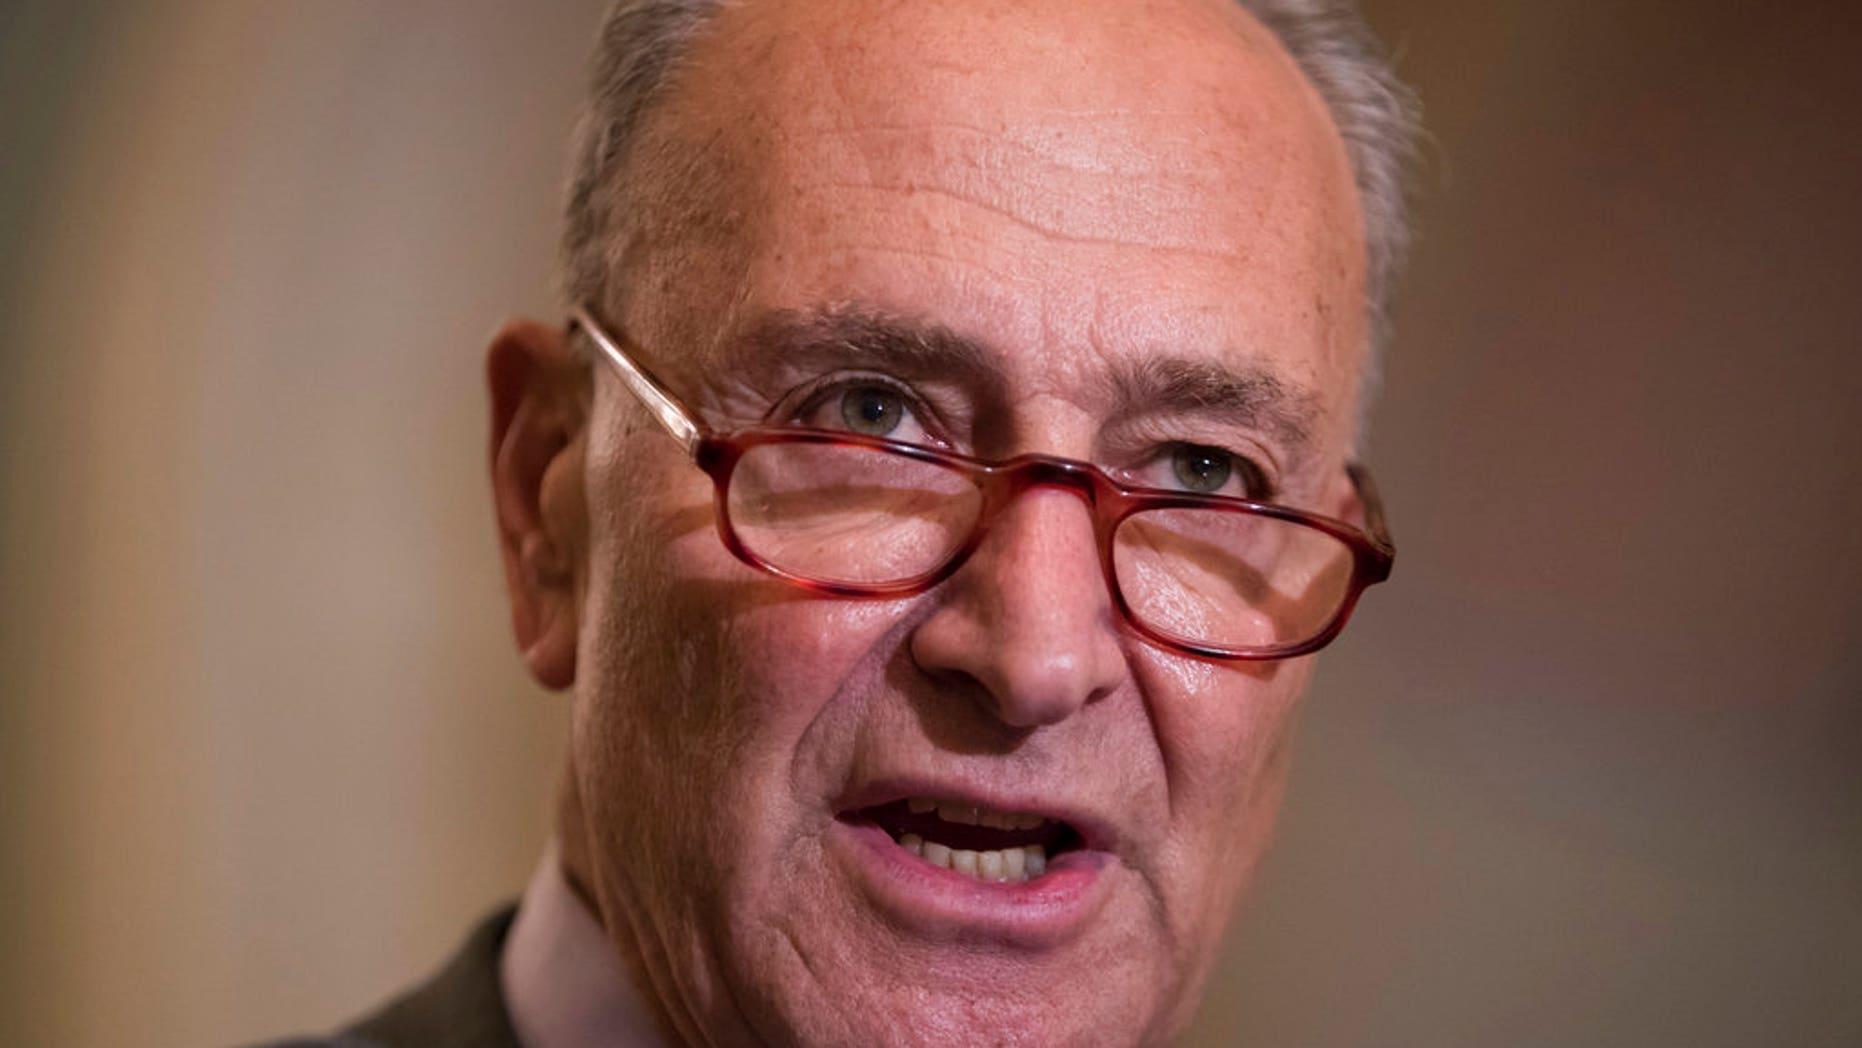 Chuck Schumer, D-N.Y., Chief of Minorities in the Senate.